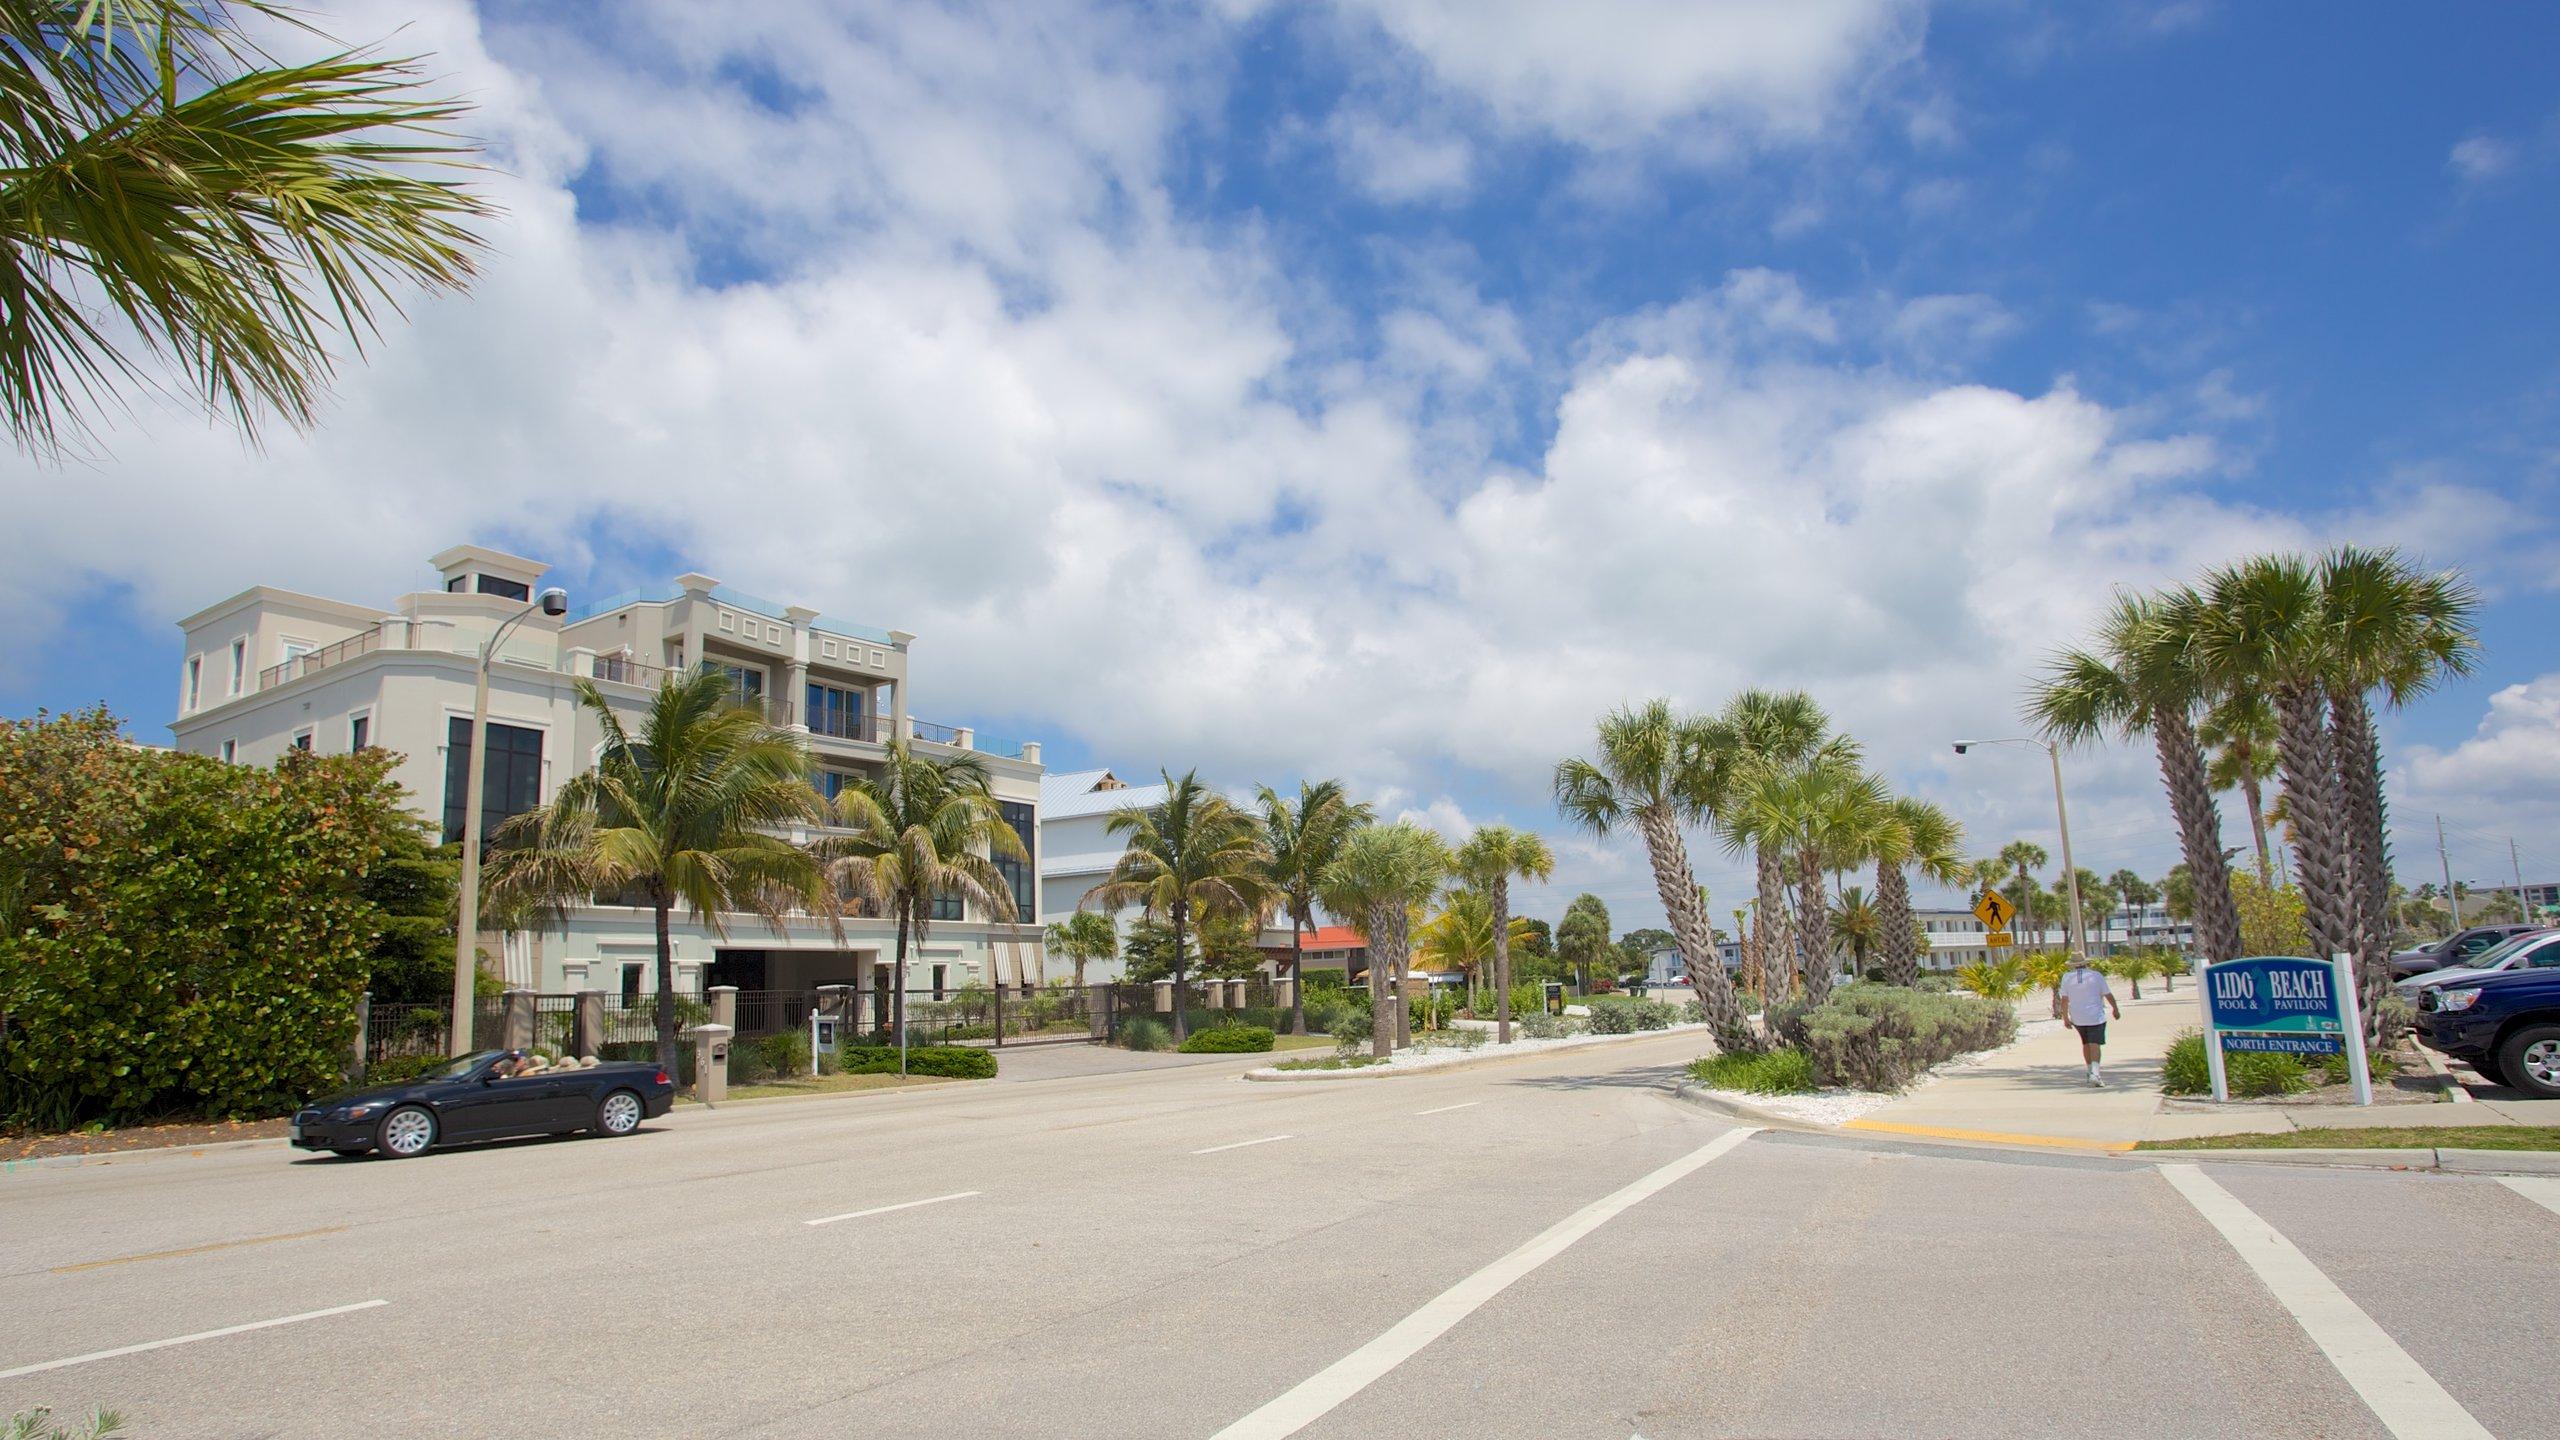 Sarasota County, Florida, Verenigde Staten